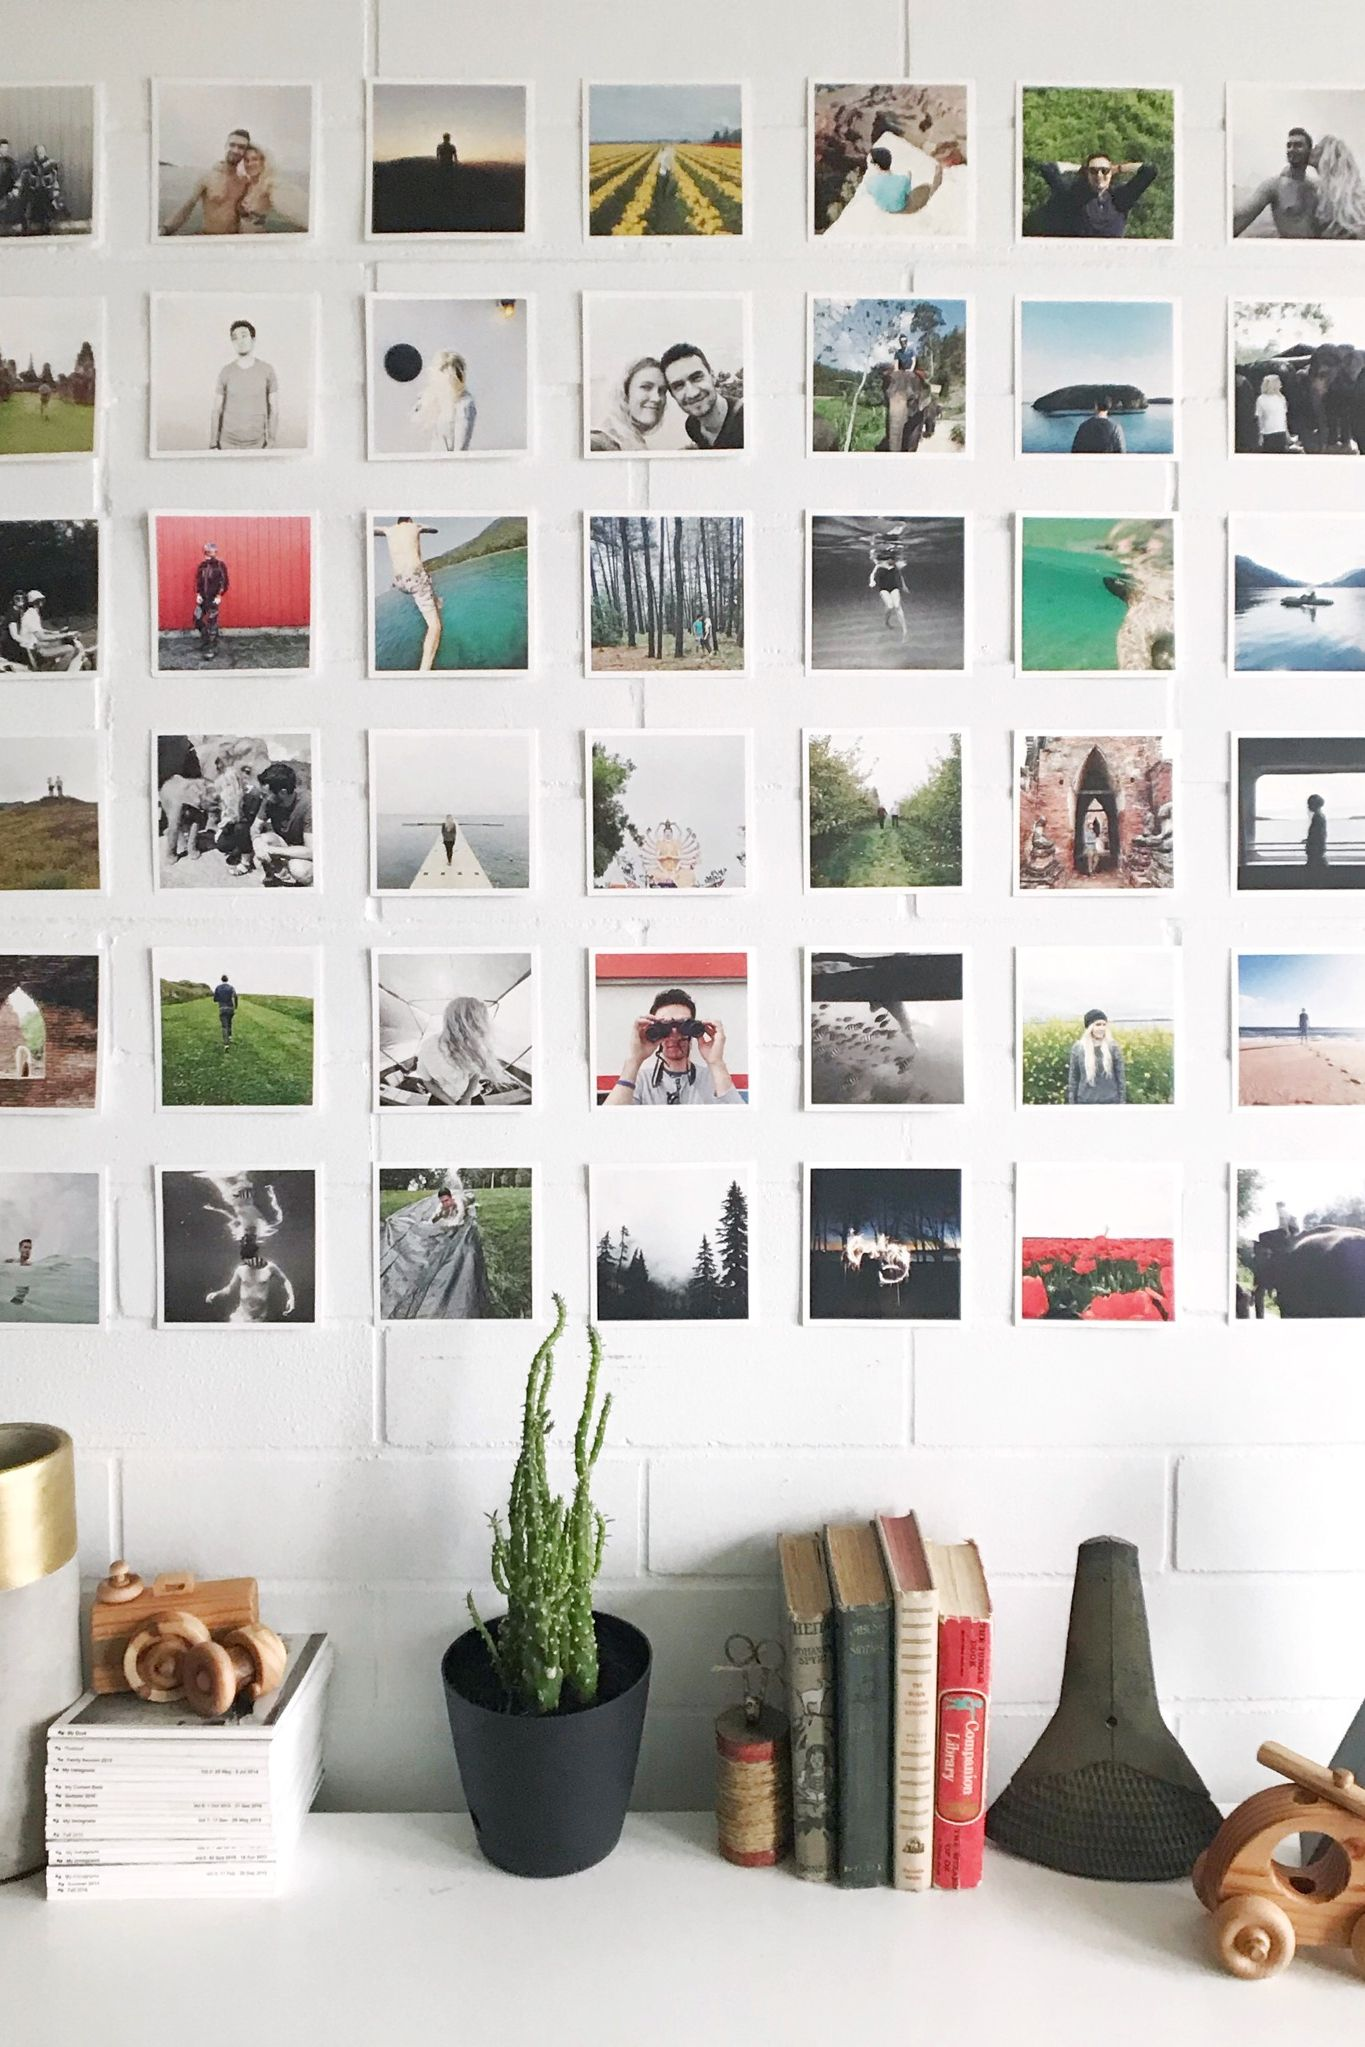 Square Photo Prints Print Instagram Photos Square Photo Prints